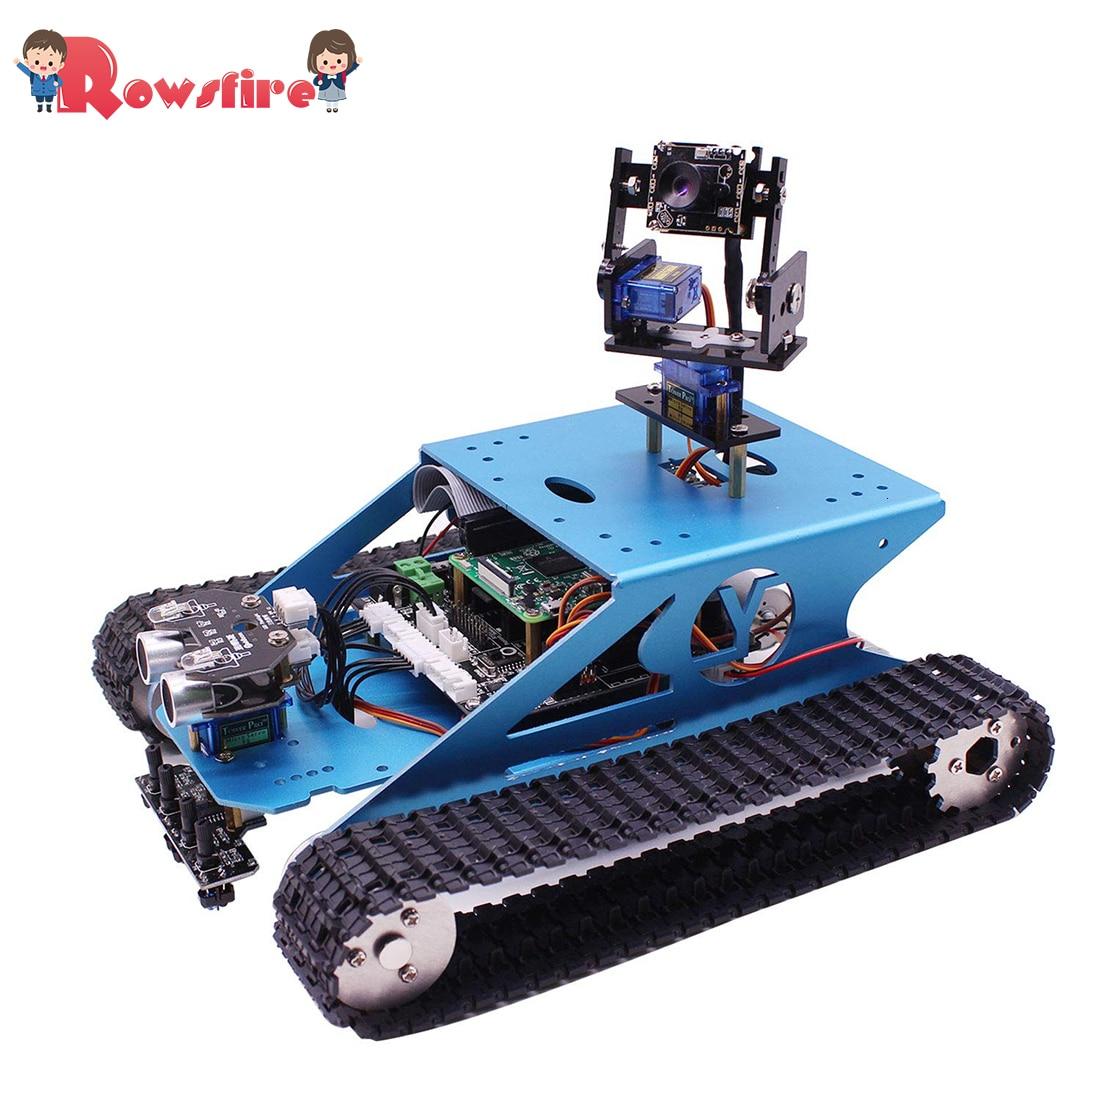 New Hot Raspberry Pi Tank Smart Robotic Kit WiFi Wireless Video Programming Electronic Toy DIY Robot Kit For Kids Adults